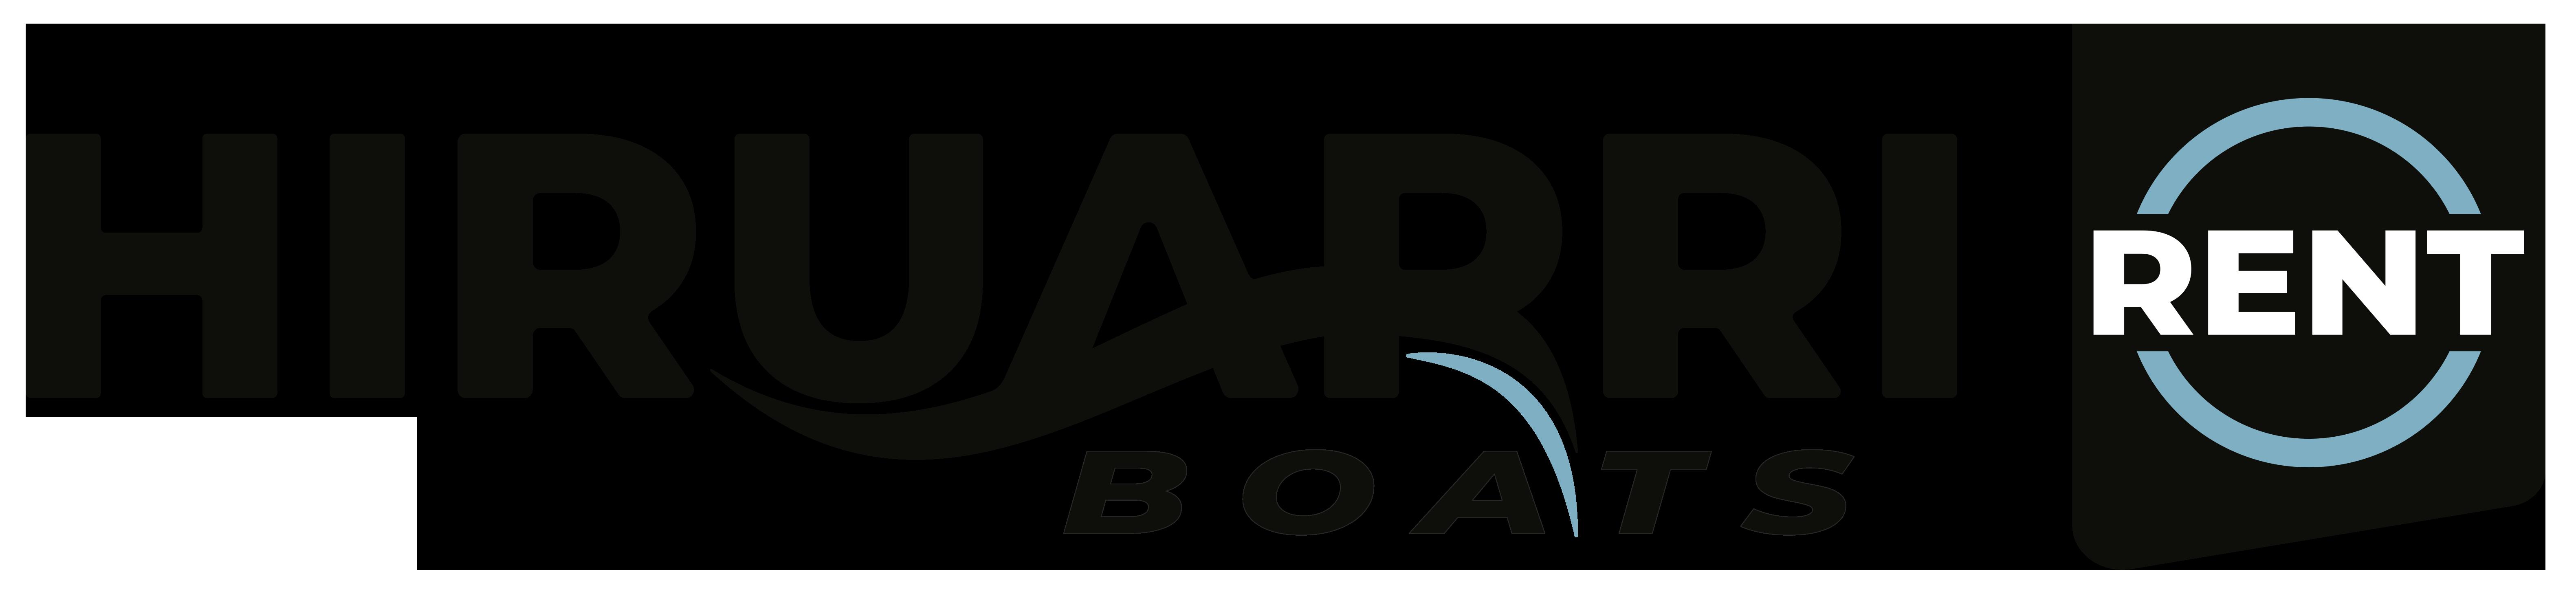 Hiruarri Boats